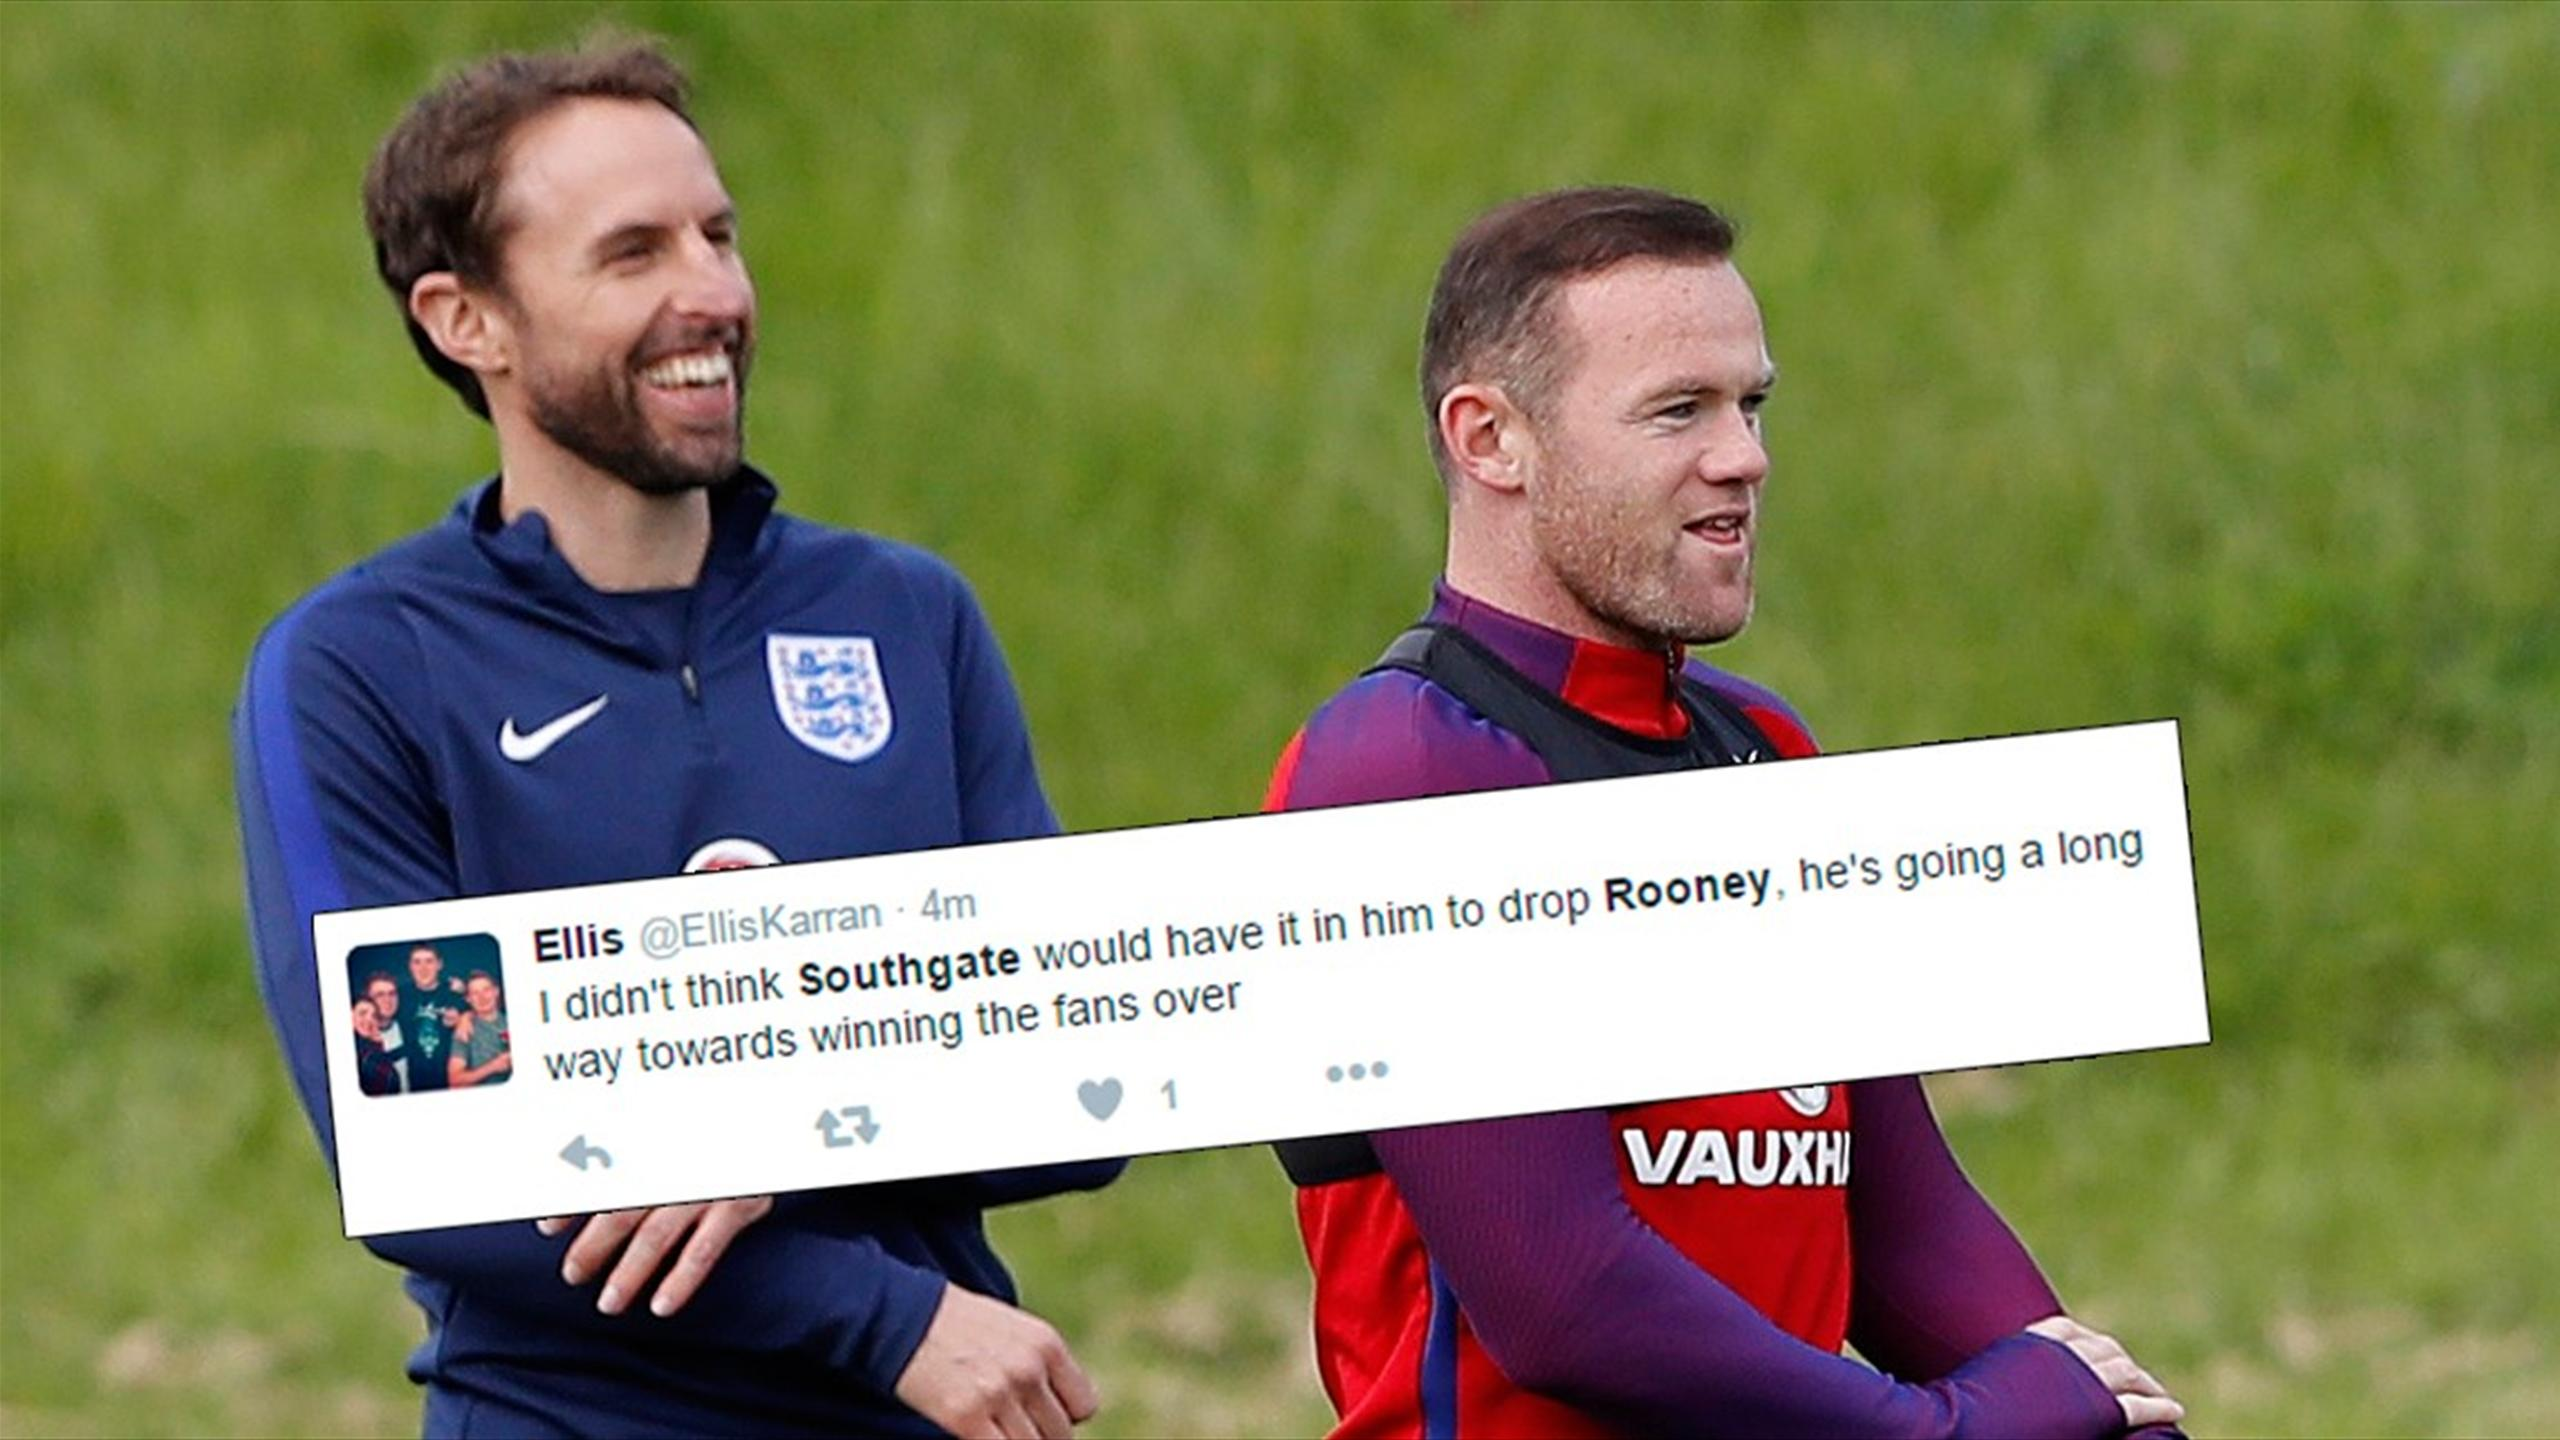 Twitter reaction to England boss Gareth Southgate dropping Wayne Rooney